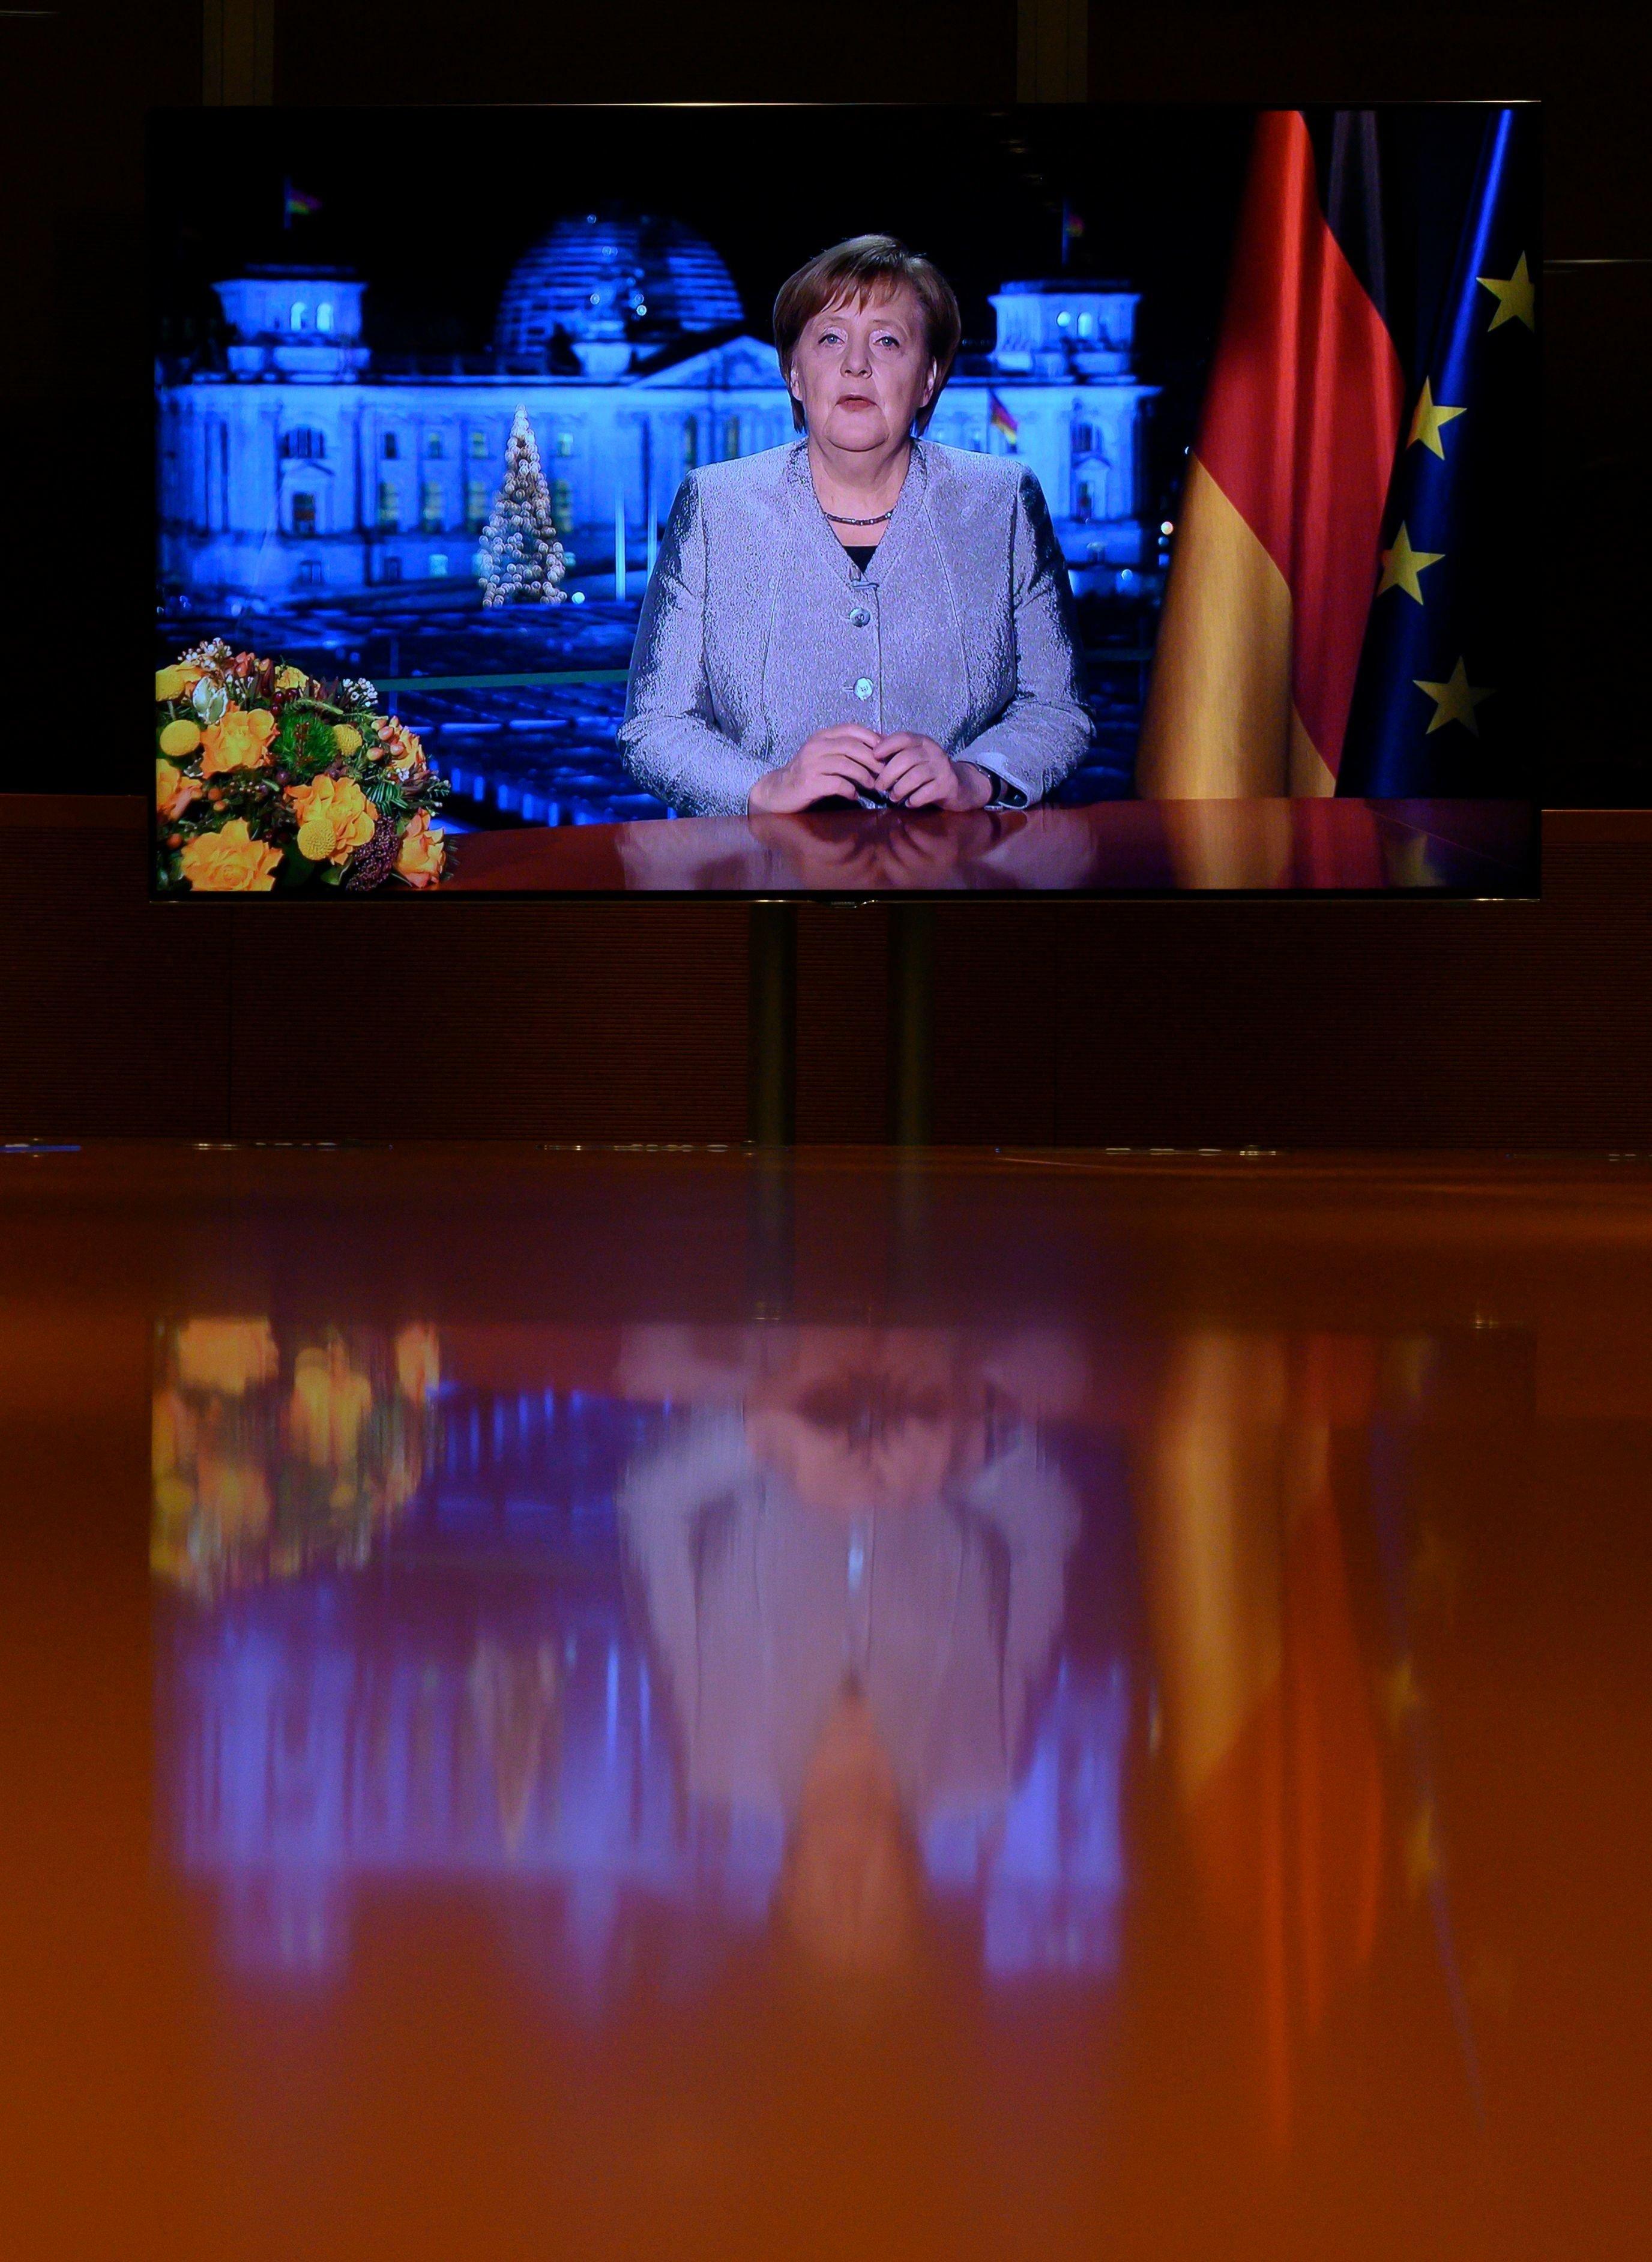 Aγωνιώδης έκκληση της Μέρκελ στους Γερμανούς για ενότητα το